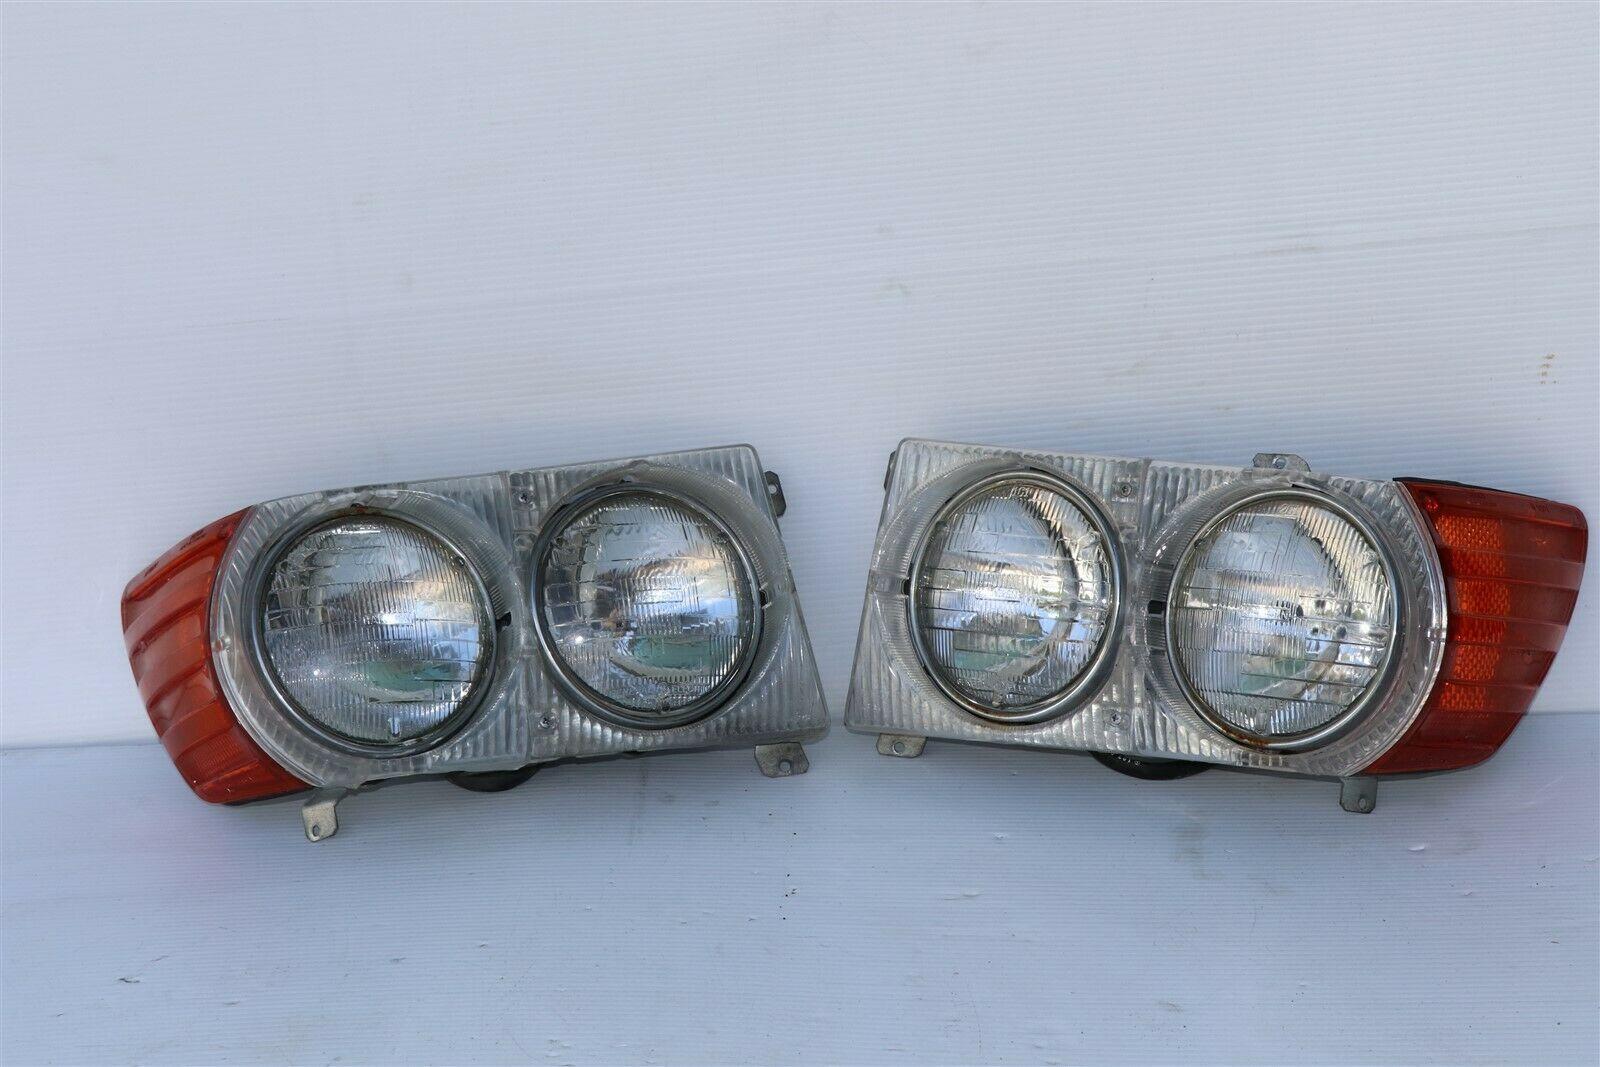 Mercedes W107 450SL 560SL USDM Headlights Headlight Assemblies Set